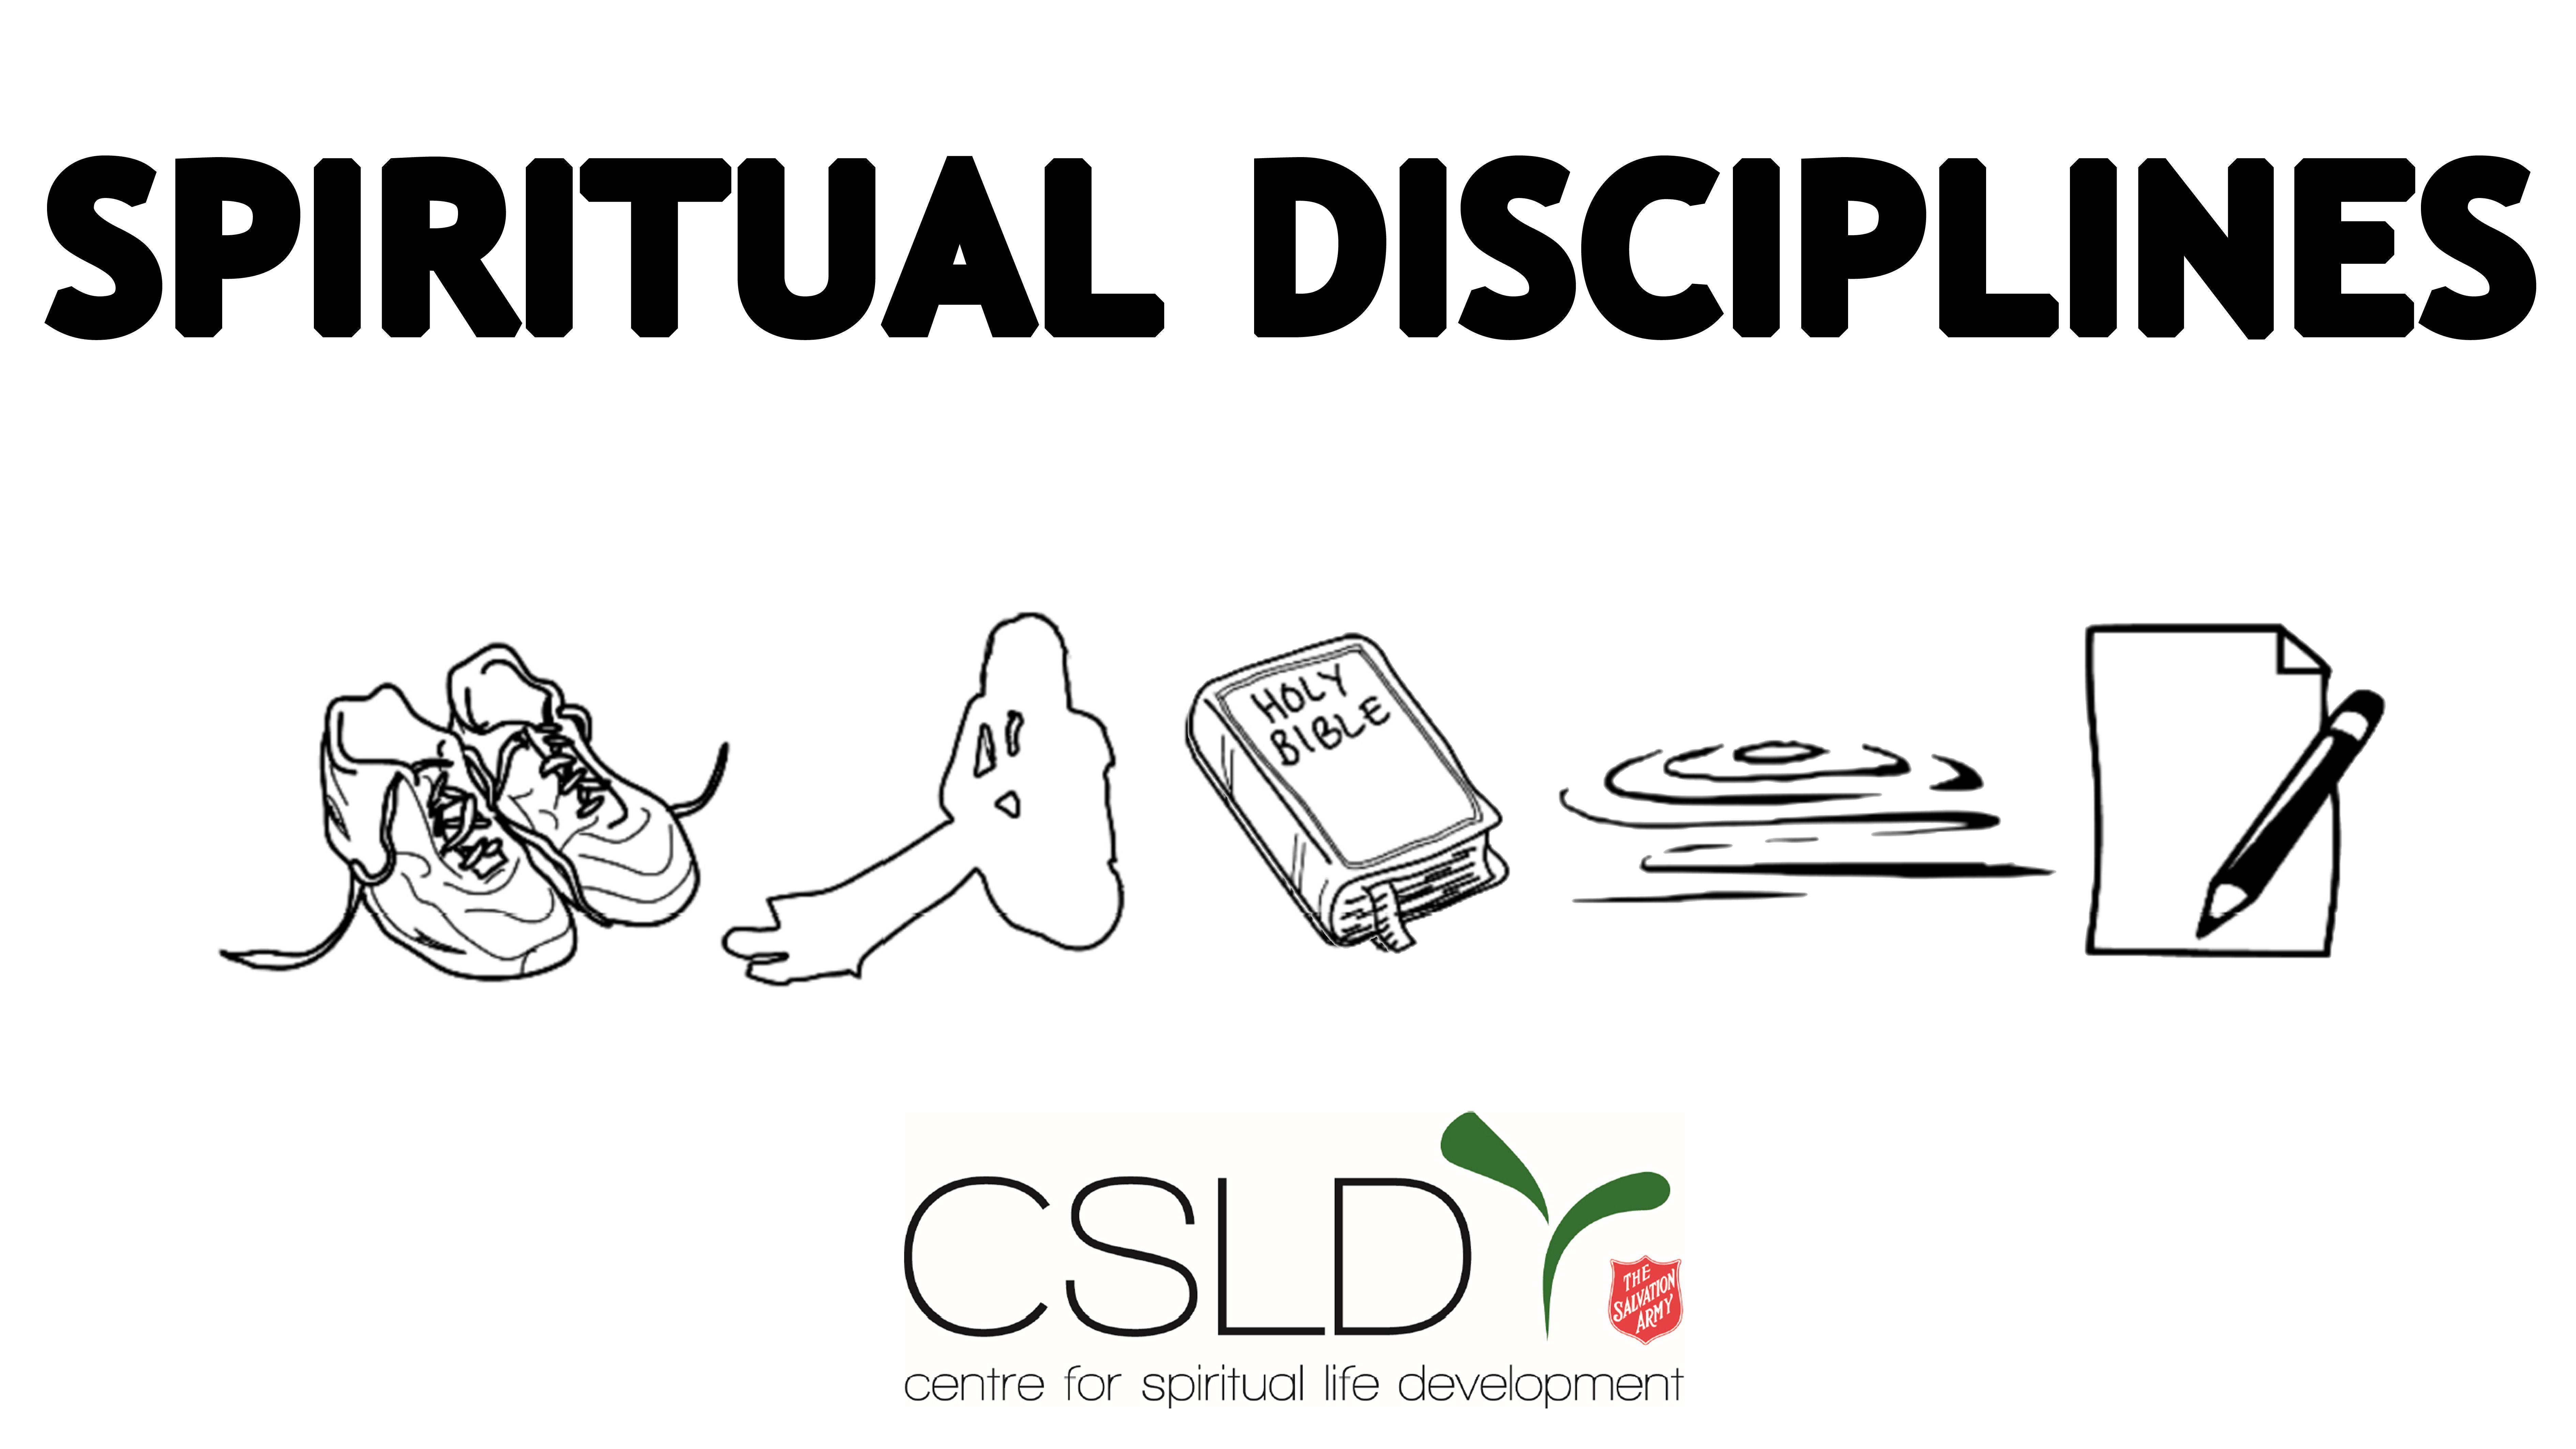 Spiritual disciplines spiritual disciplines spiritual